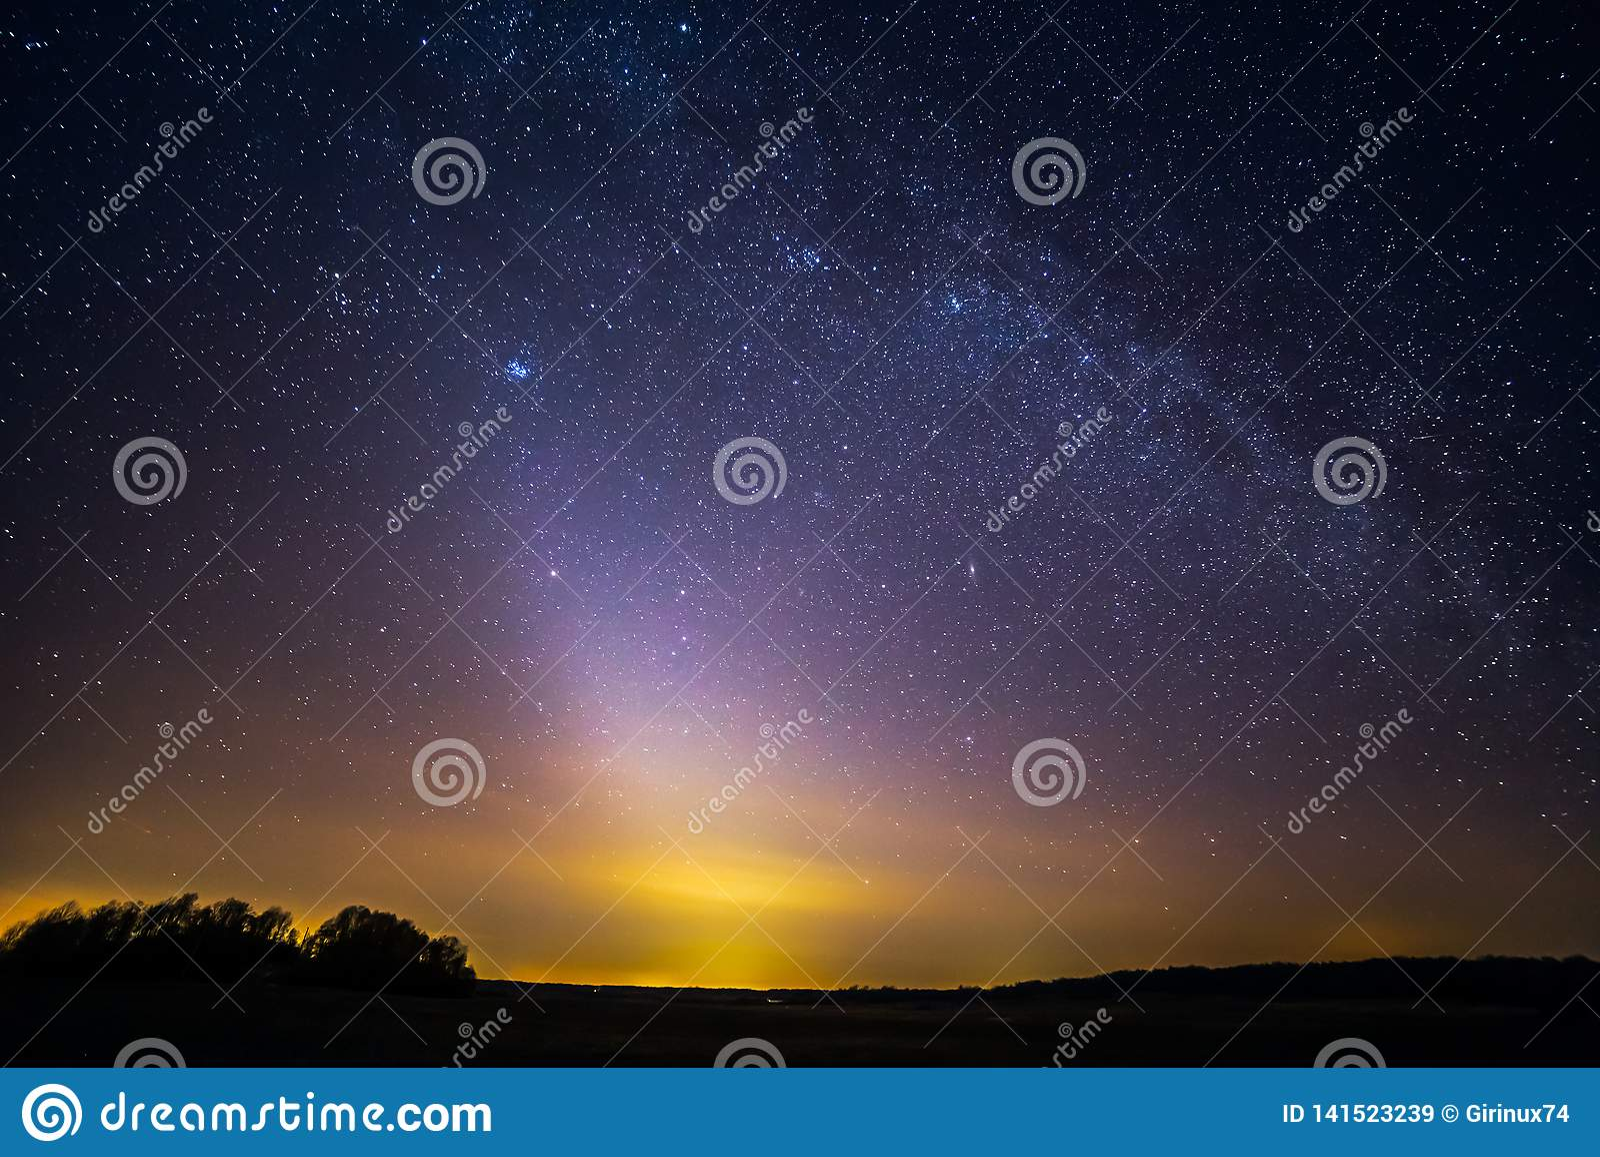 Seltenes Phänomen - Zodiacal Licht